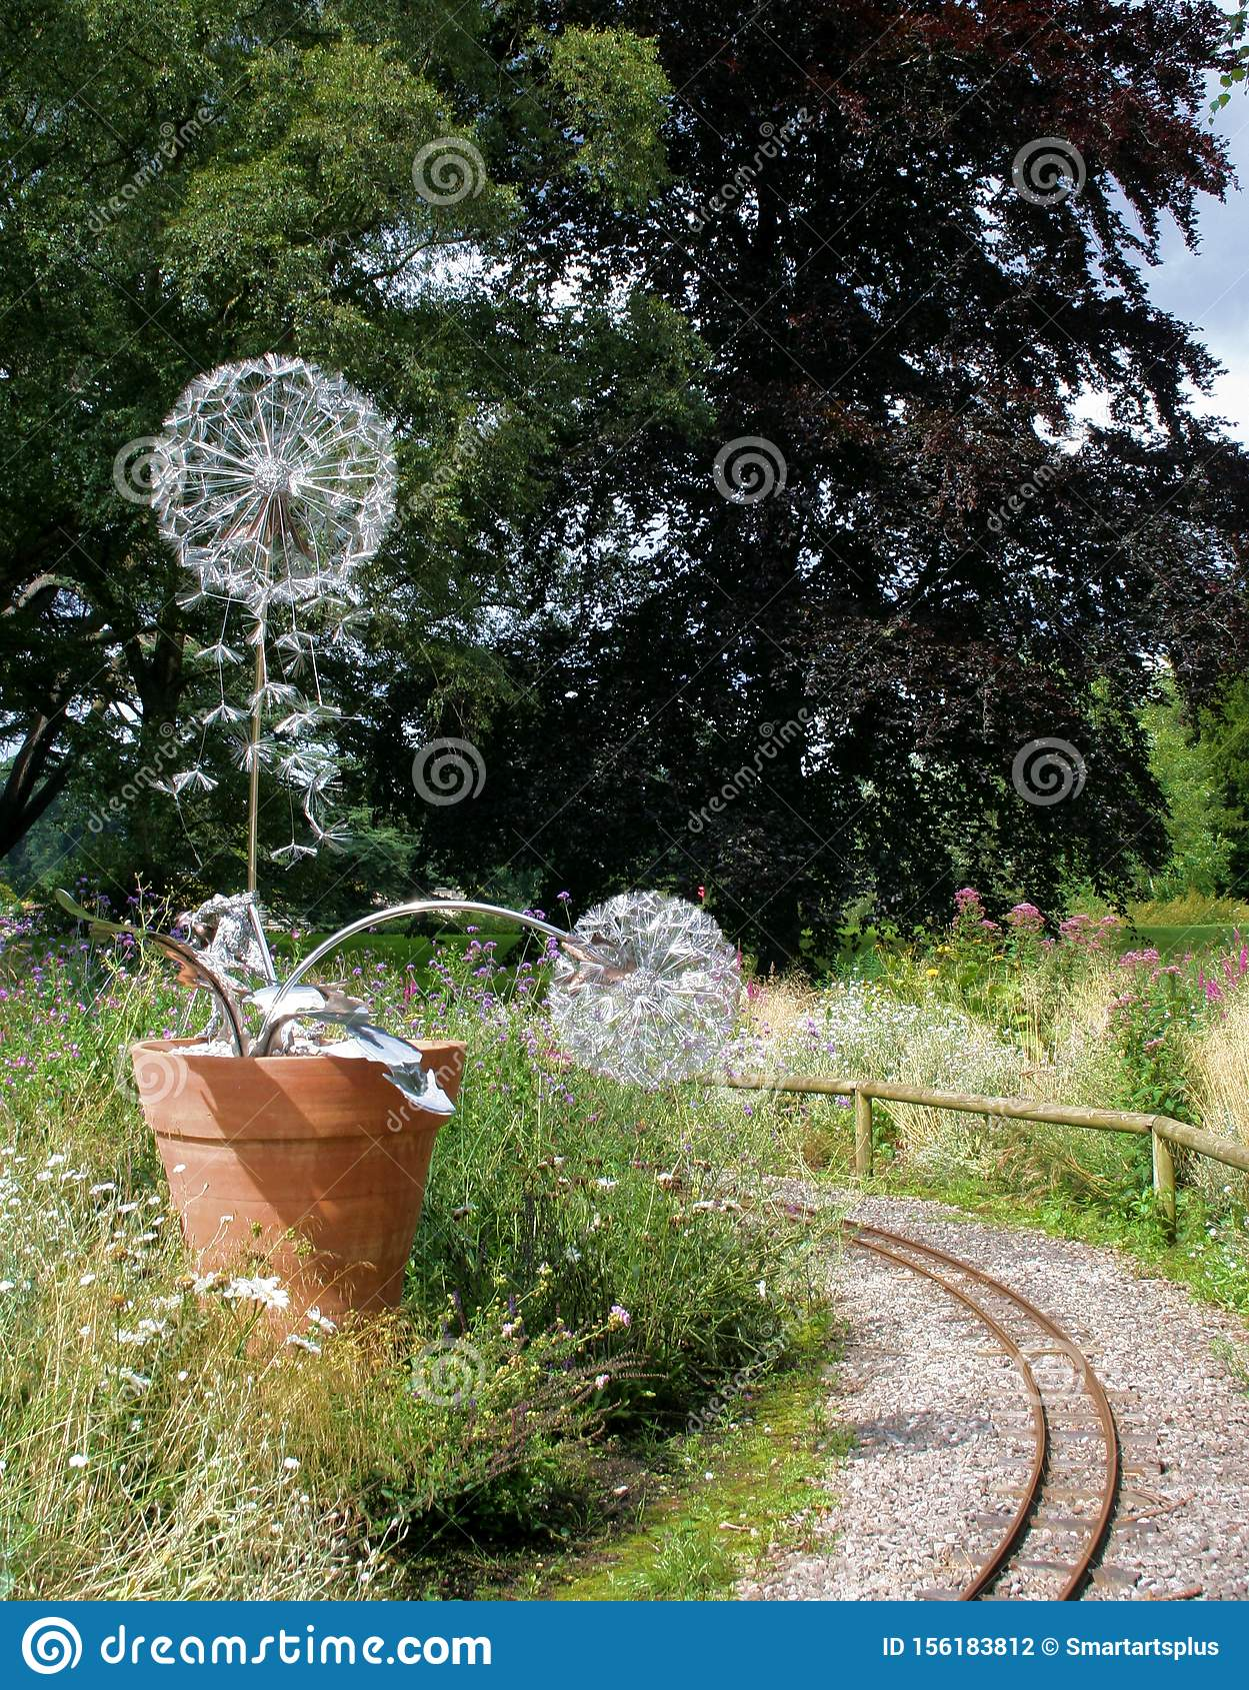 Hidden Fairy & Dandelion Sculptures at Trentham Estate 1